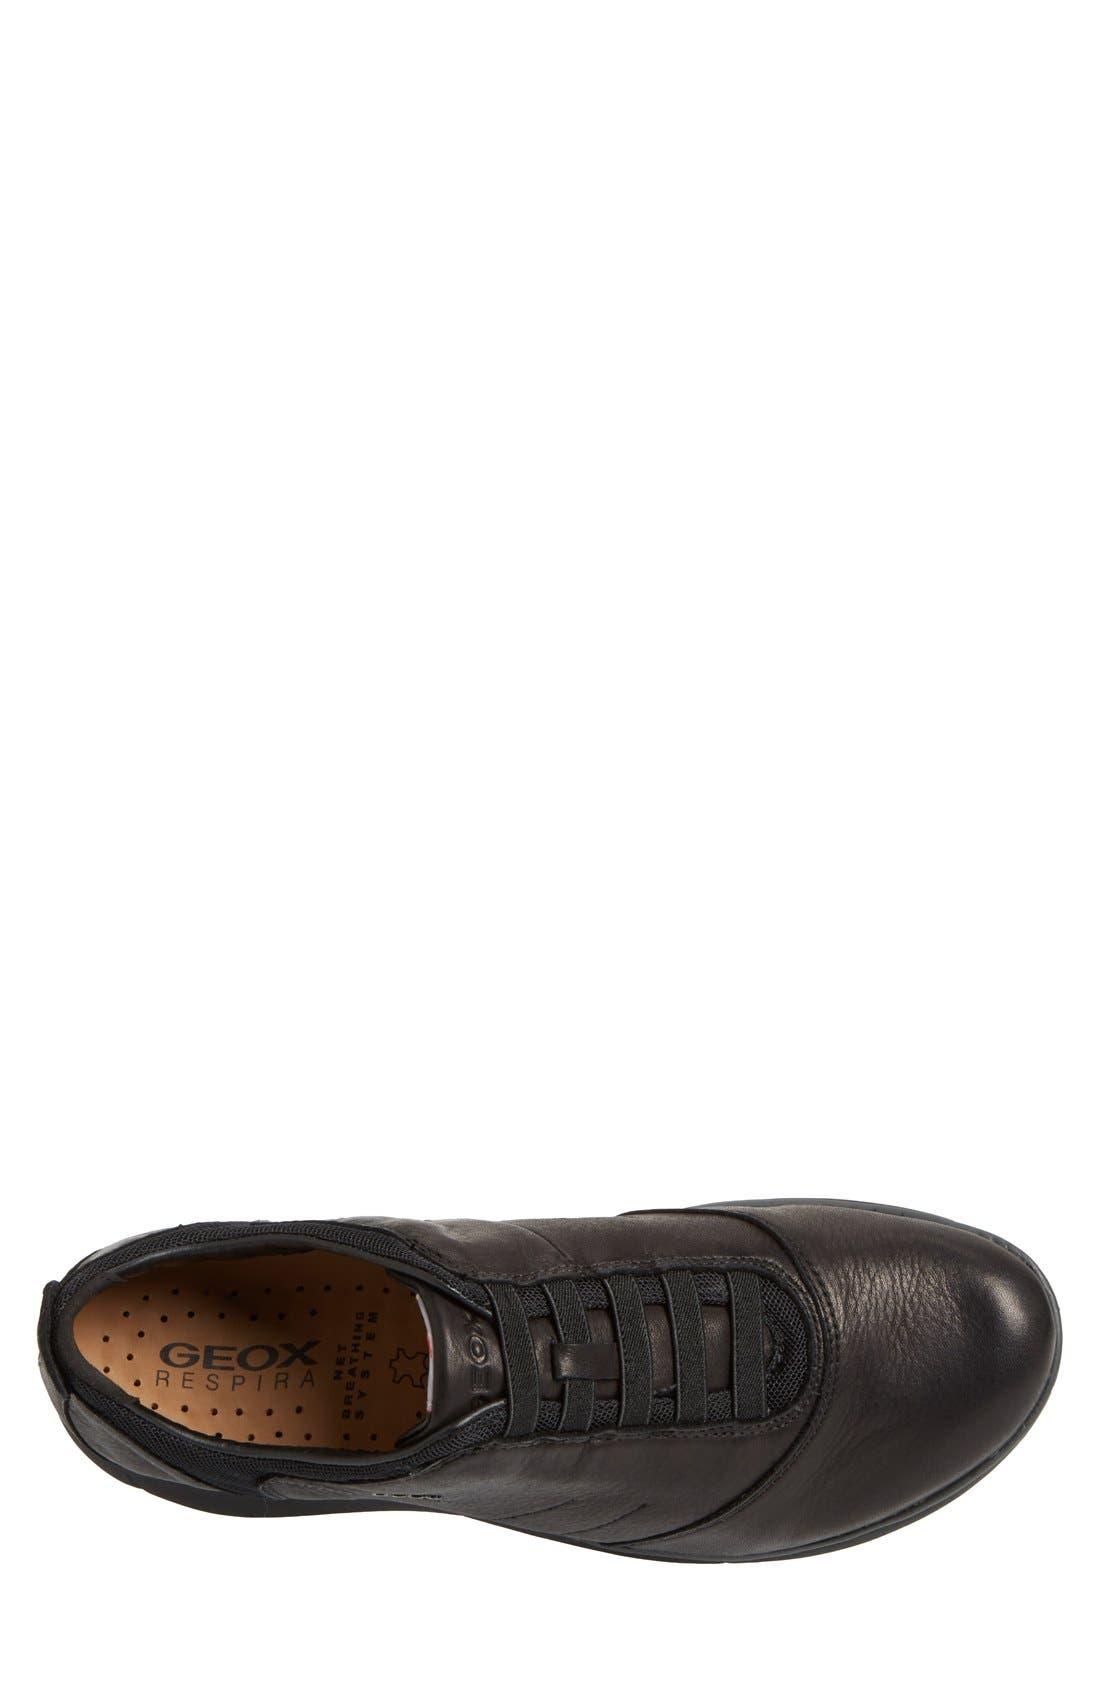 'Nebula 8' Sneaker,                             Alternate thumbnail 7, color,                             BLACK